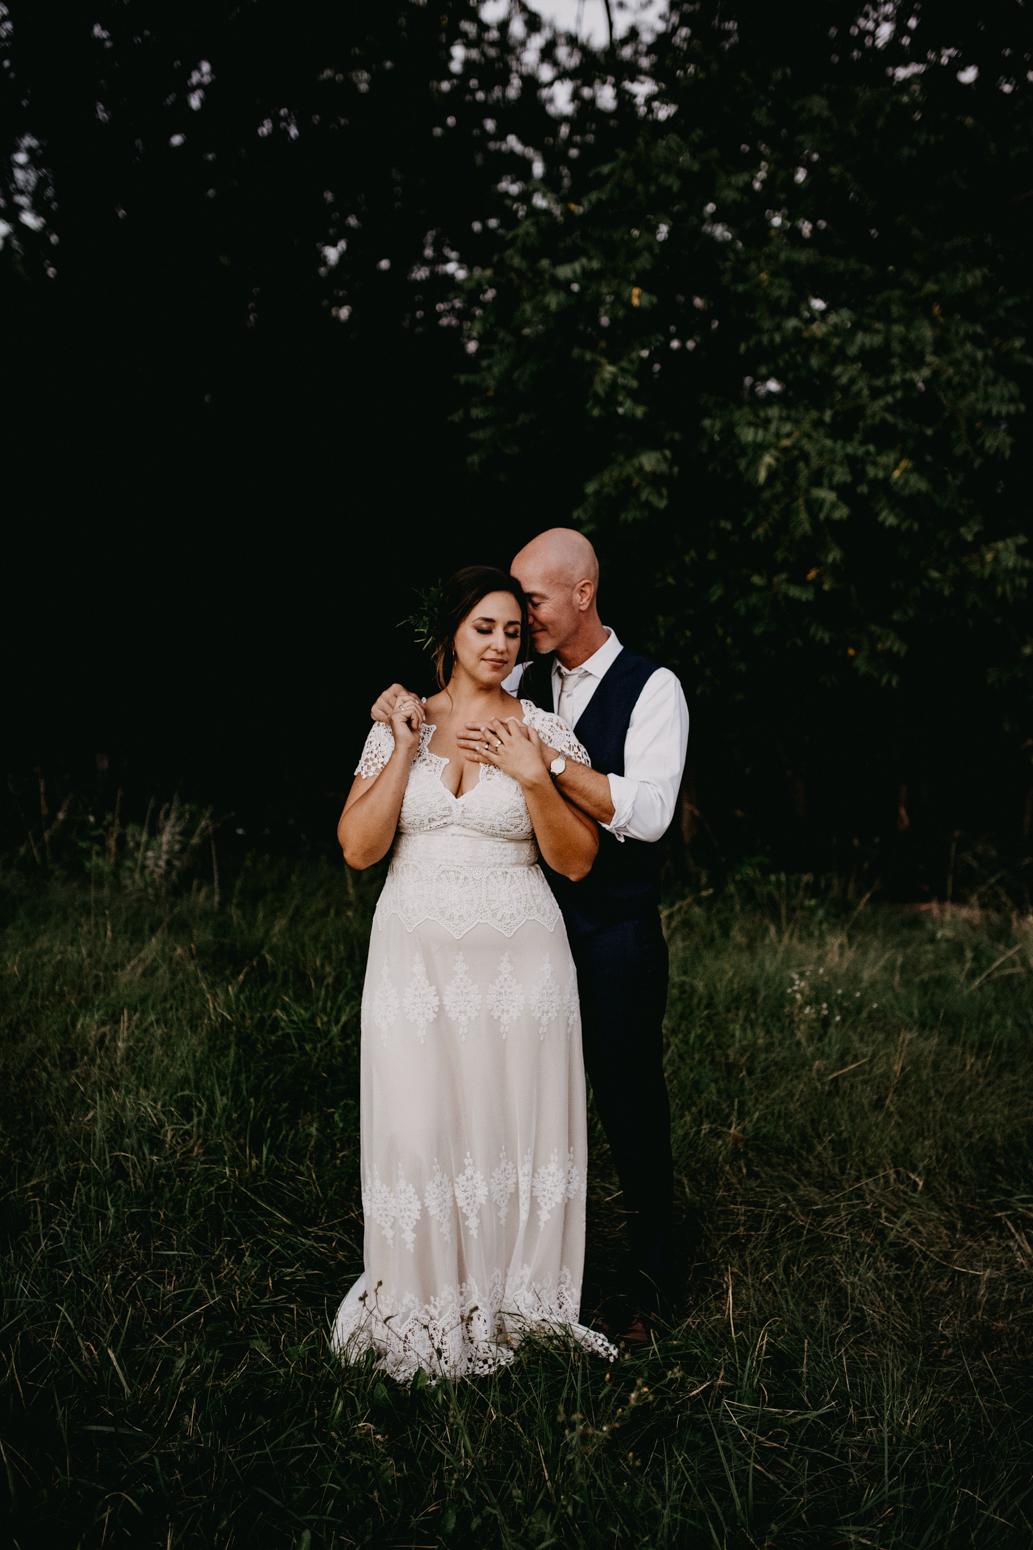 Rochester, NY Wedding Photographer (124 of 133).jpg